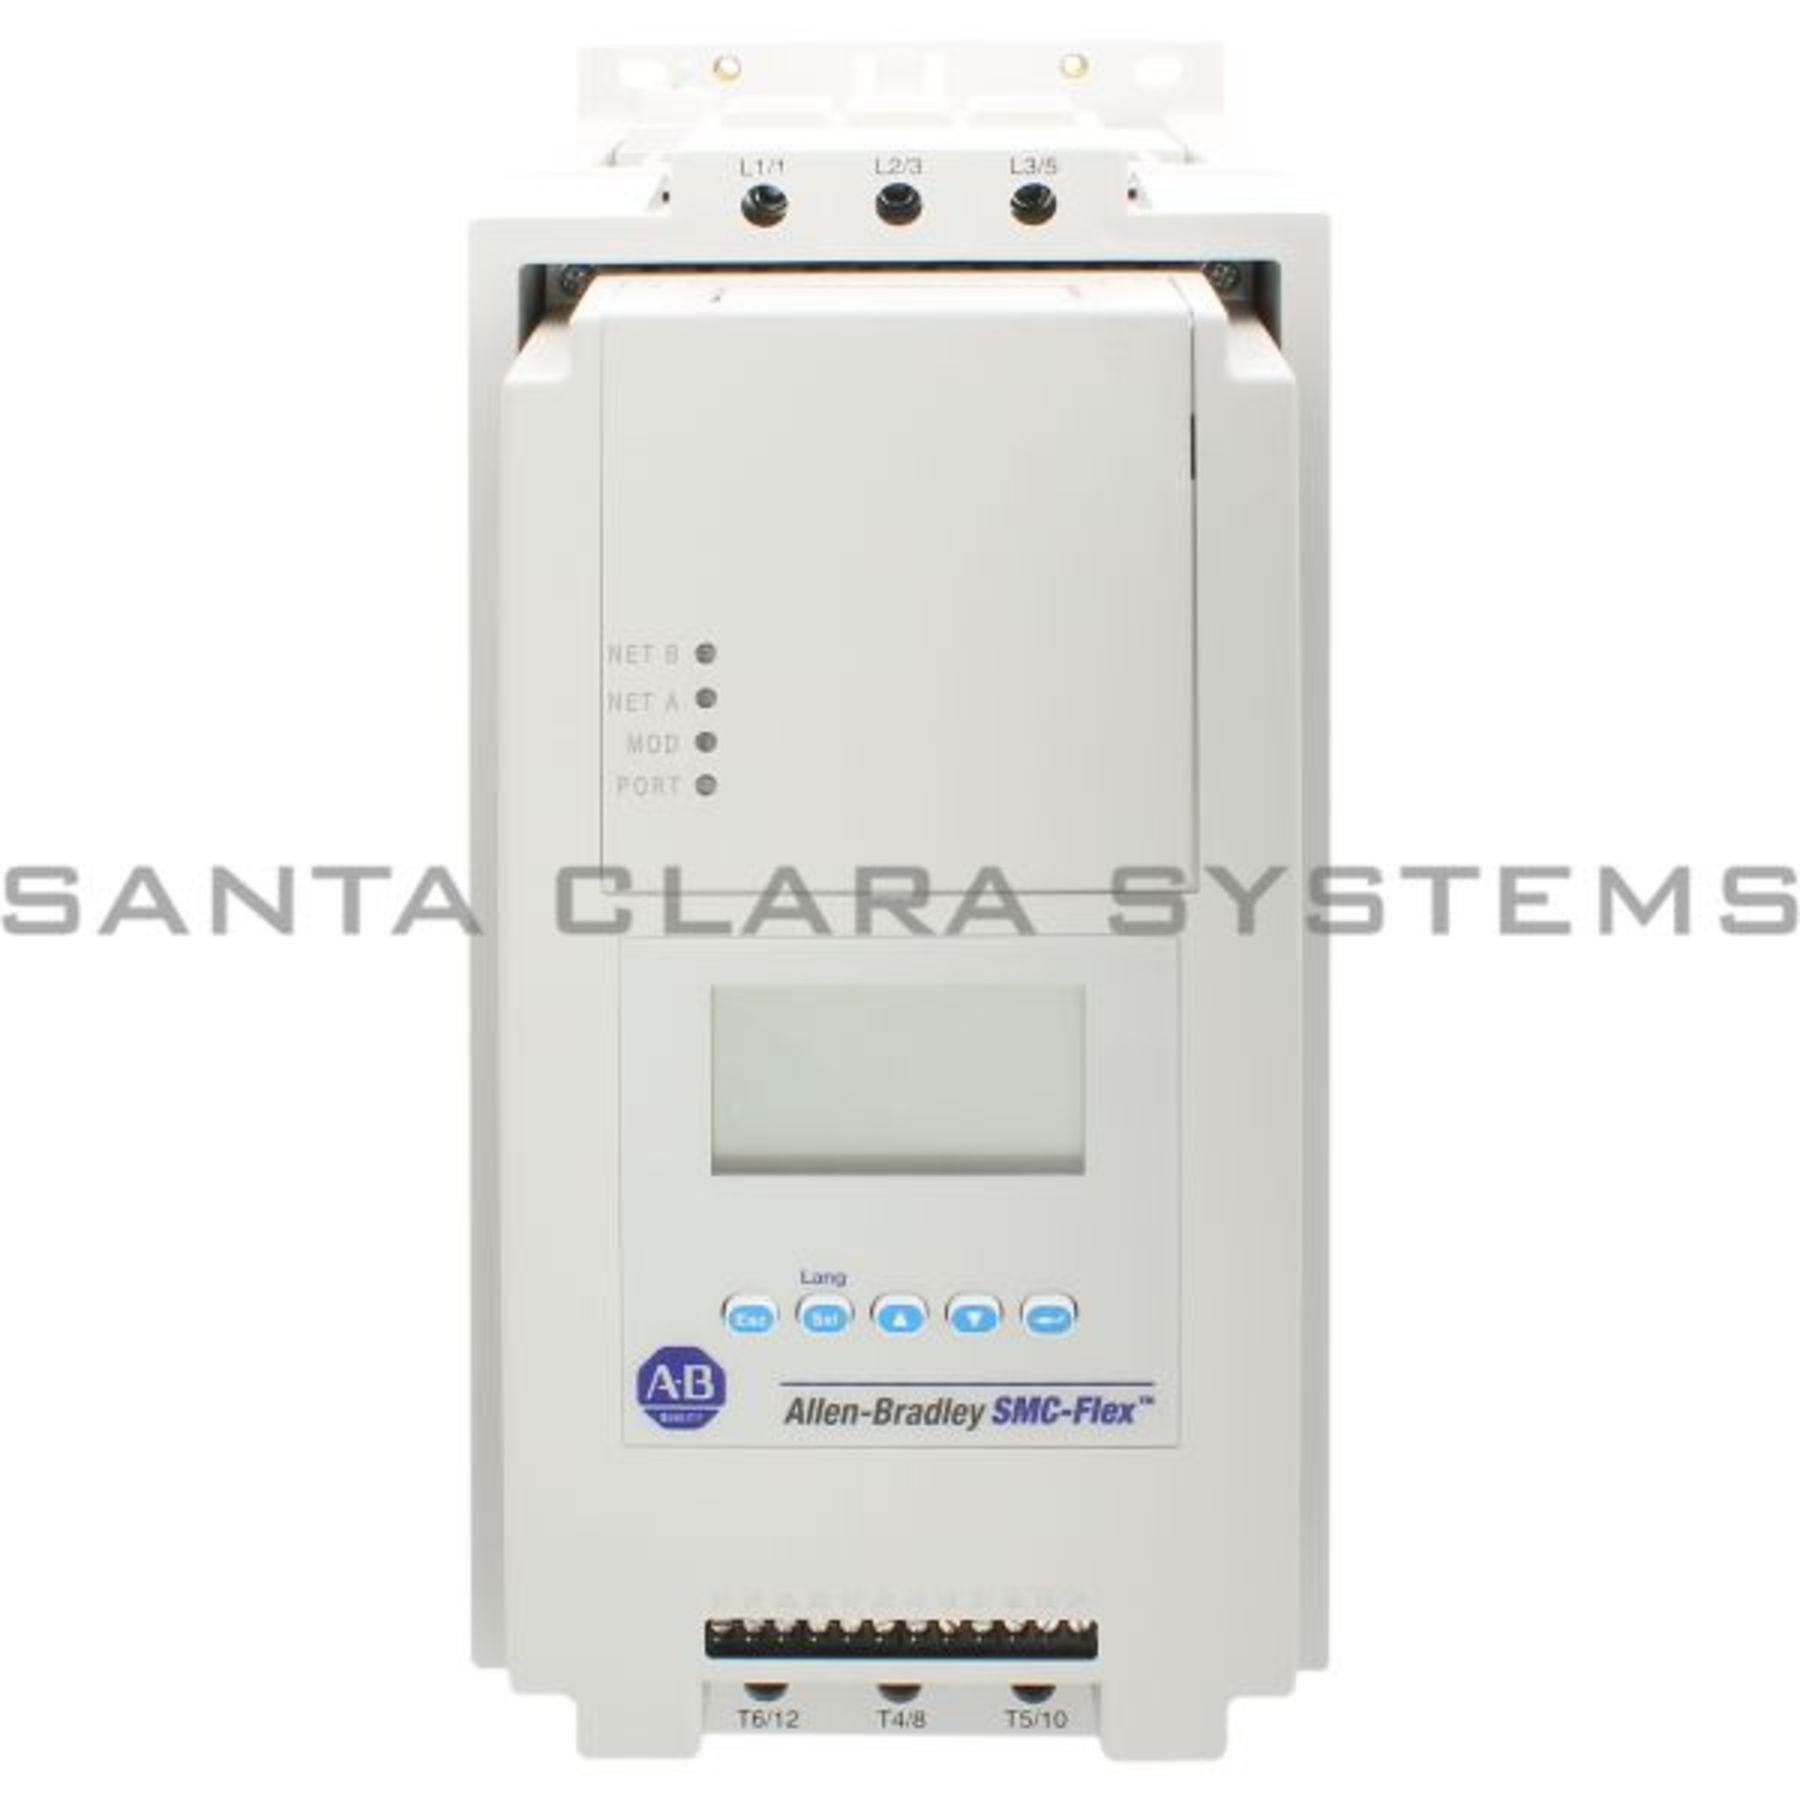 150 F43ncd Allen Bradley In Stock And Ready To Ship Santa Clara Smart Heater Controller Smc Flex Motor Product Image